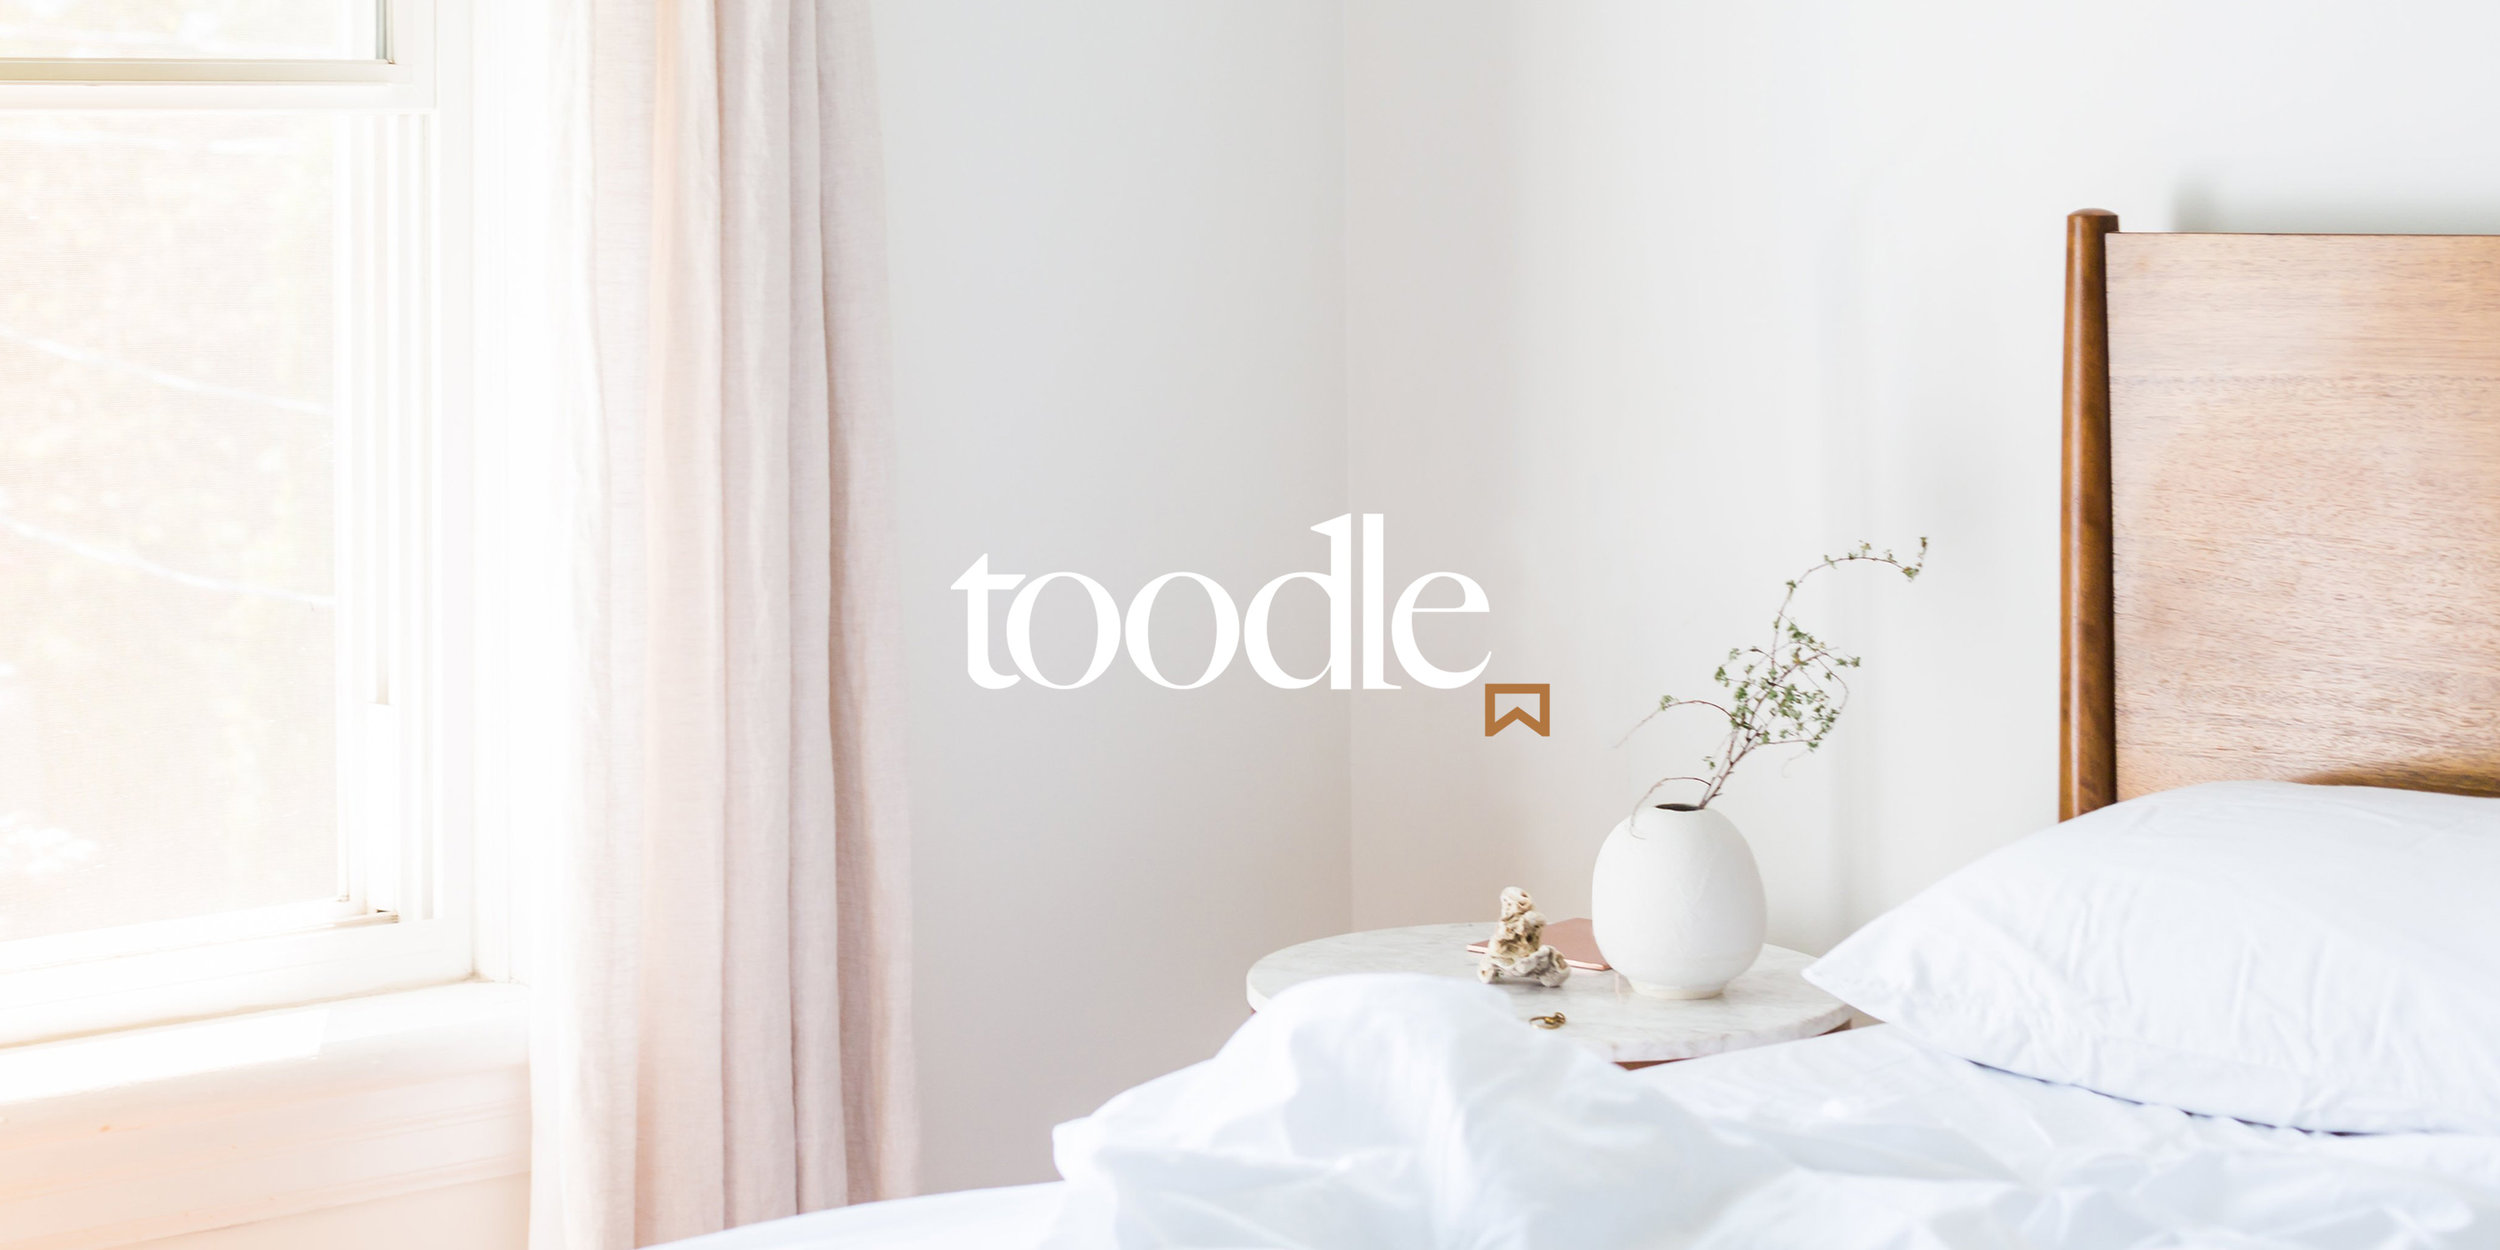 Detail-Toodle-Home-Banner2.jpg